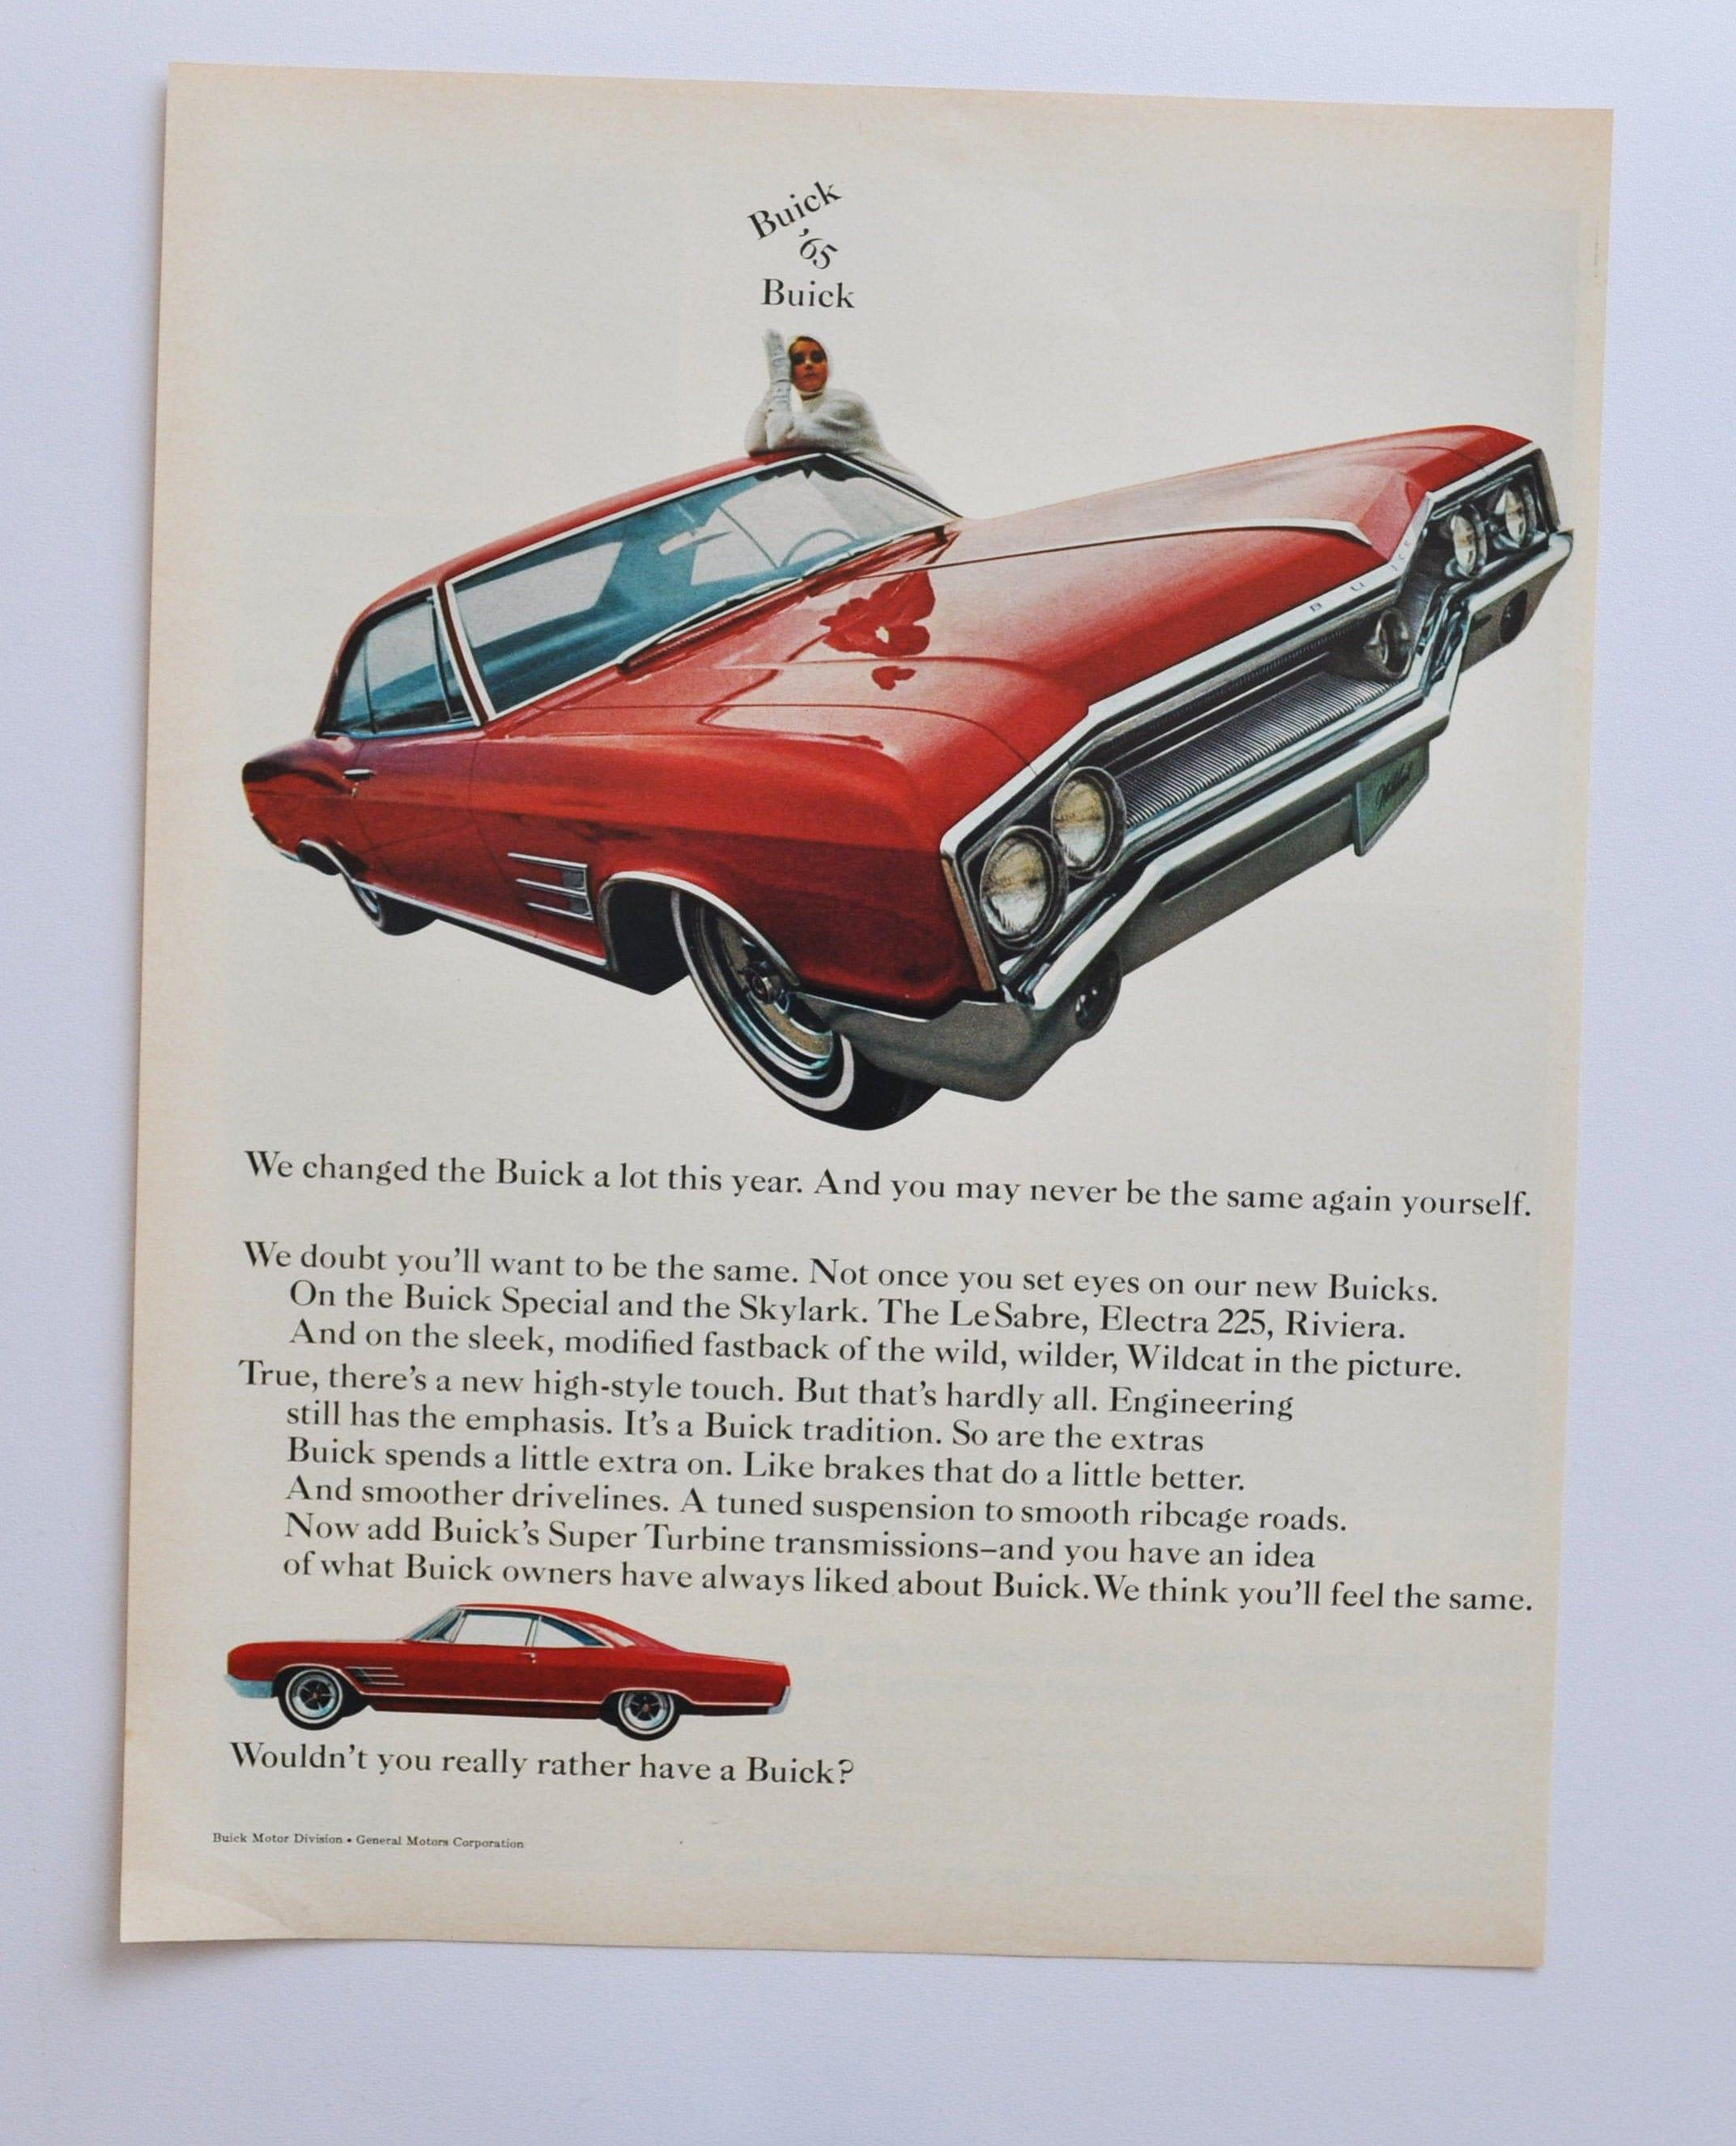 Car Ad 1965 Buick Riviera motor company classic old photo advertisement brochure retro dealer dealership classic american auto automobile